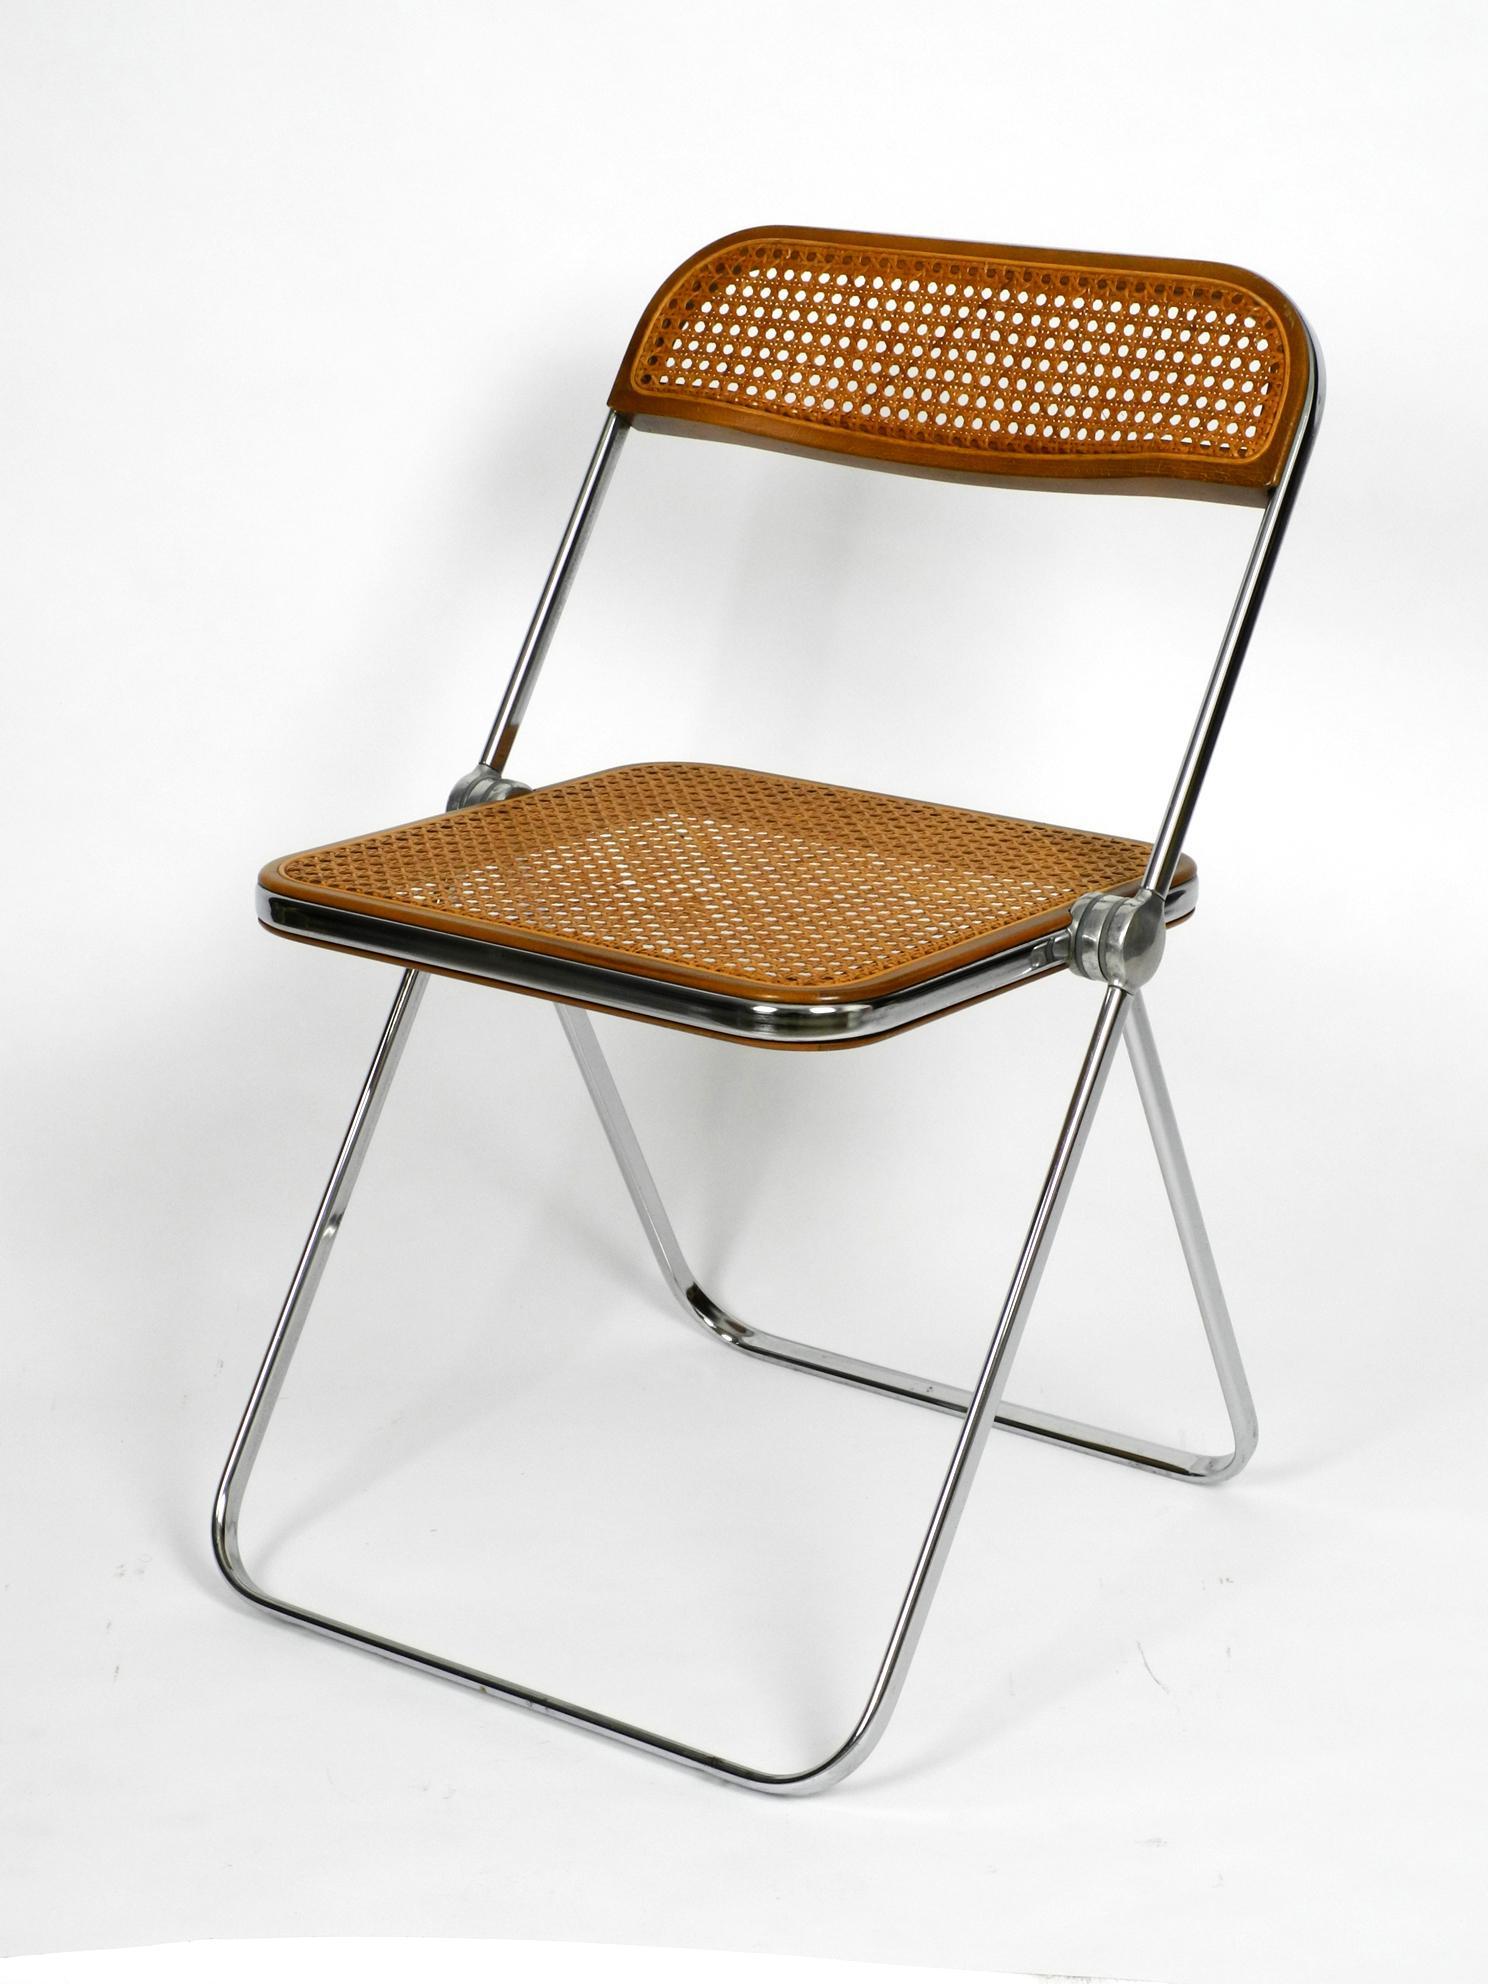 1960s Plia Folding Chair With Woven Wicker Giancarlo Piretti For Castelli 1967